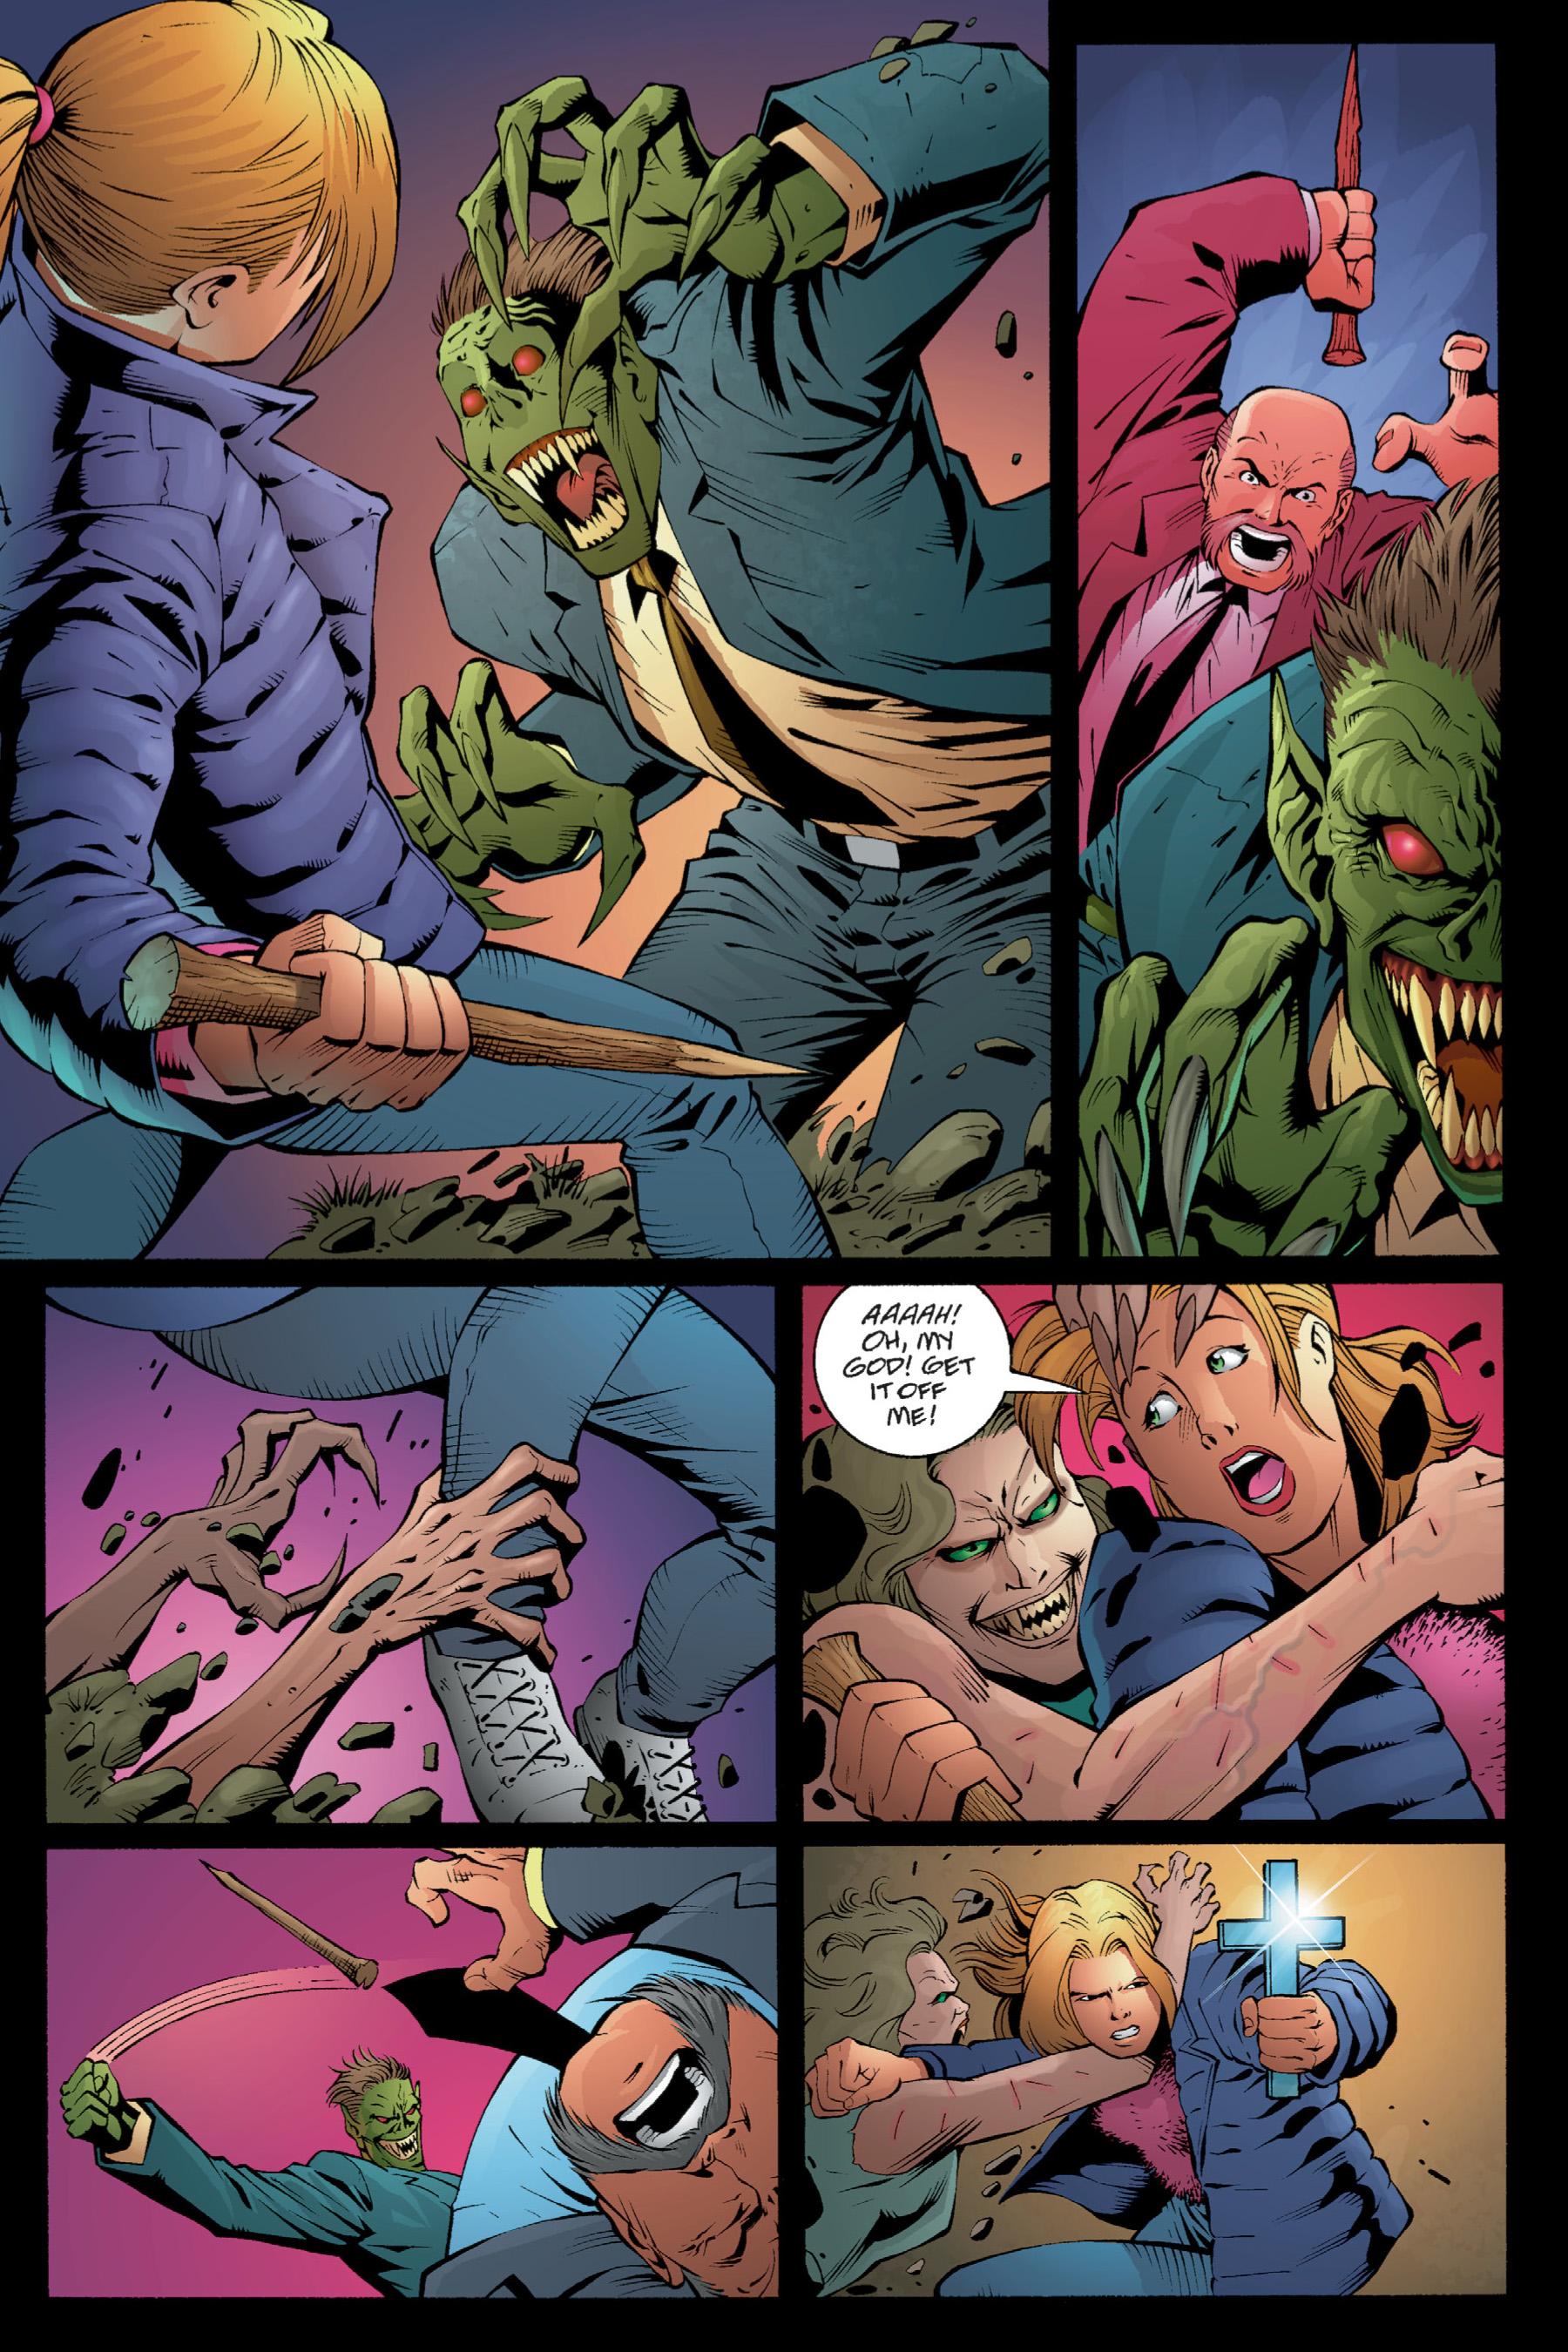 Read online Buffy the Vampire Slayer: Omnibus comic -  Issue # TPB 1 - 56